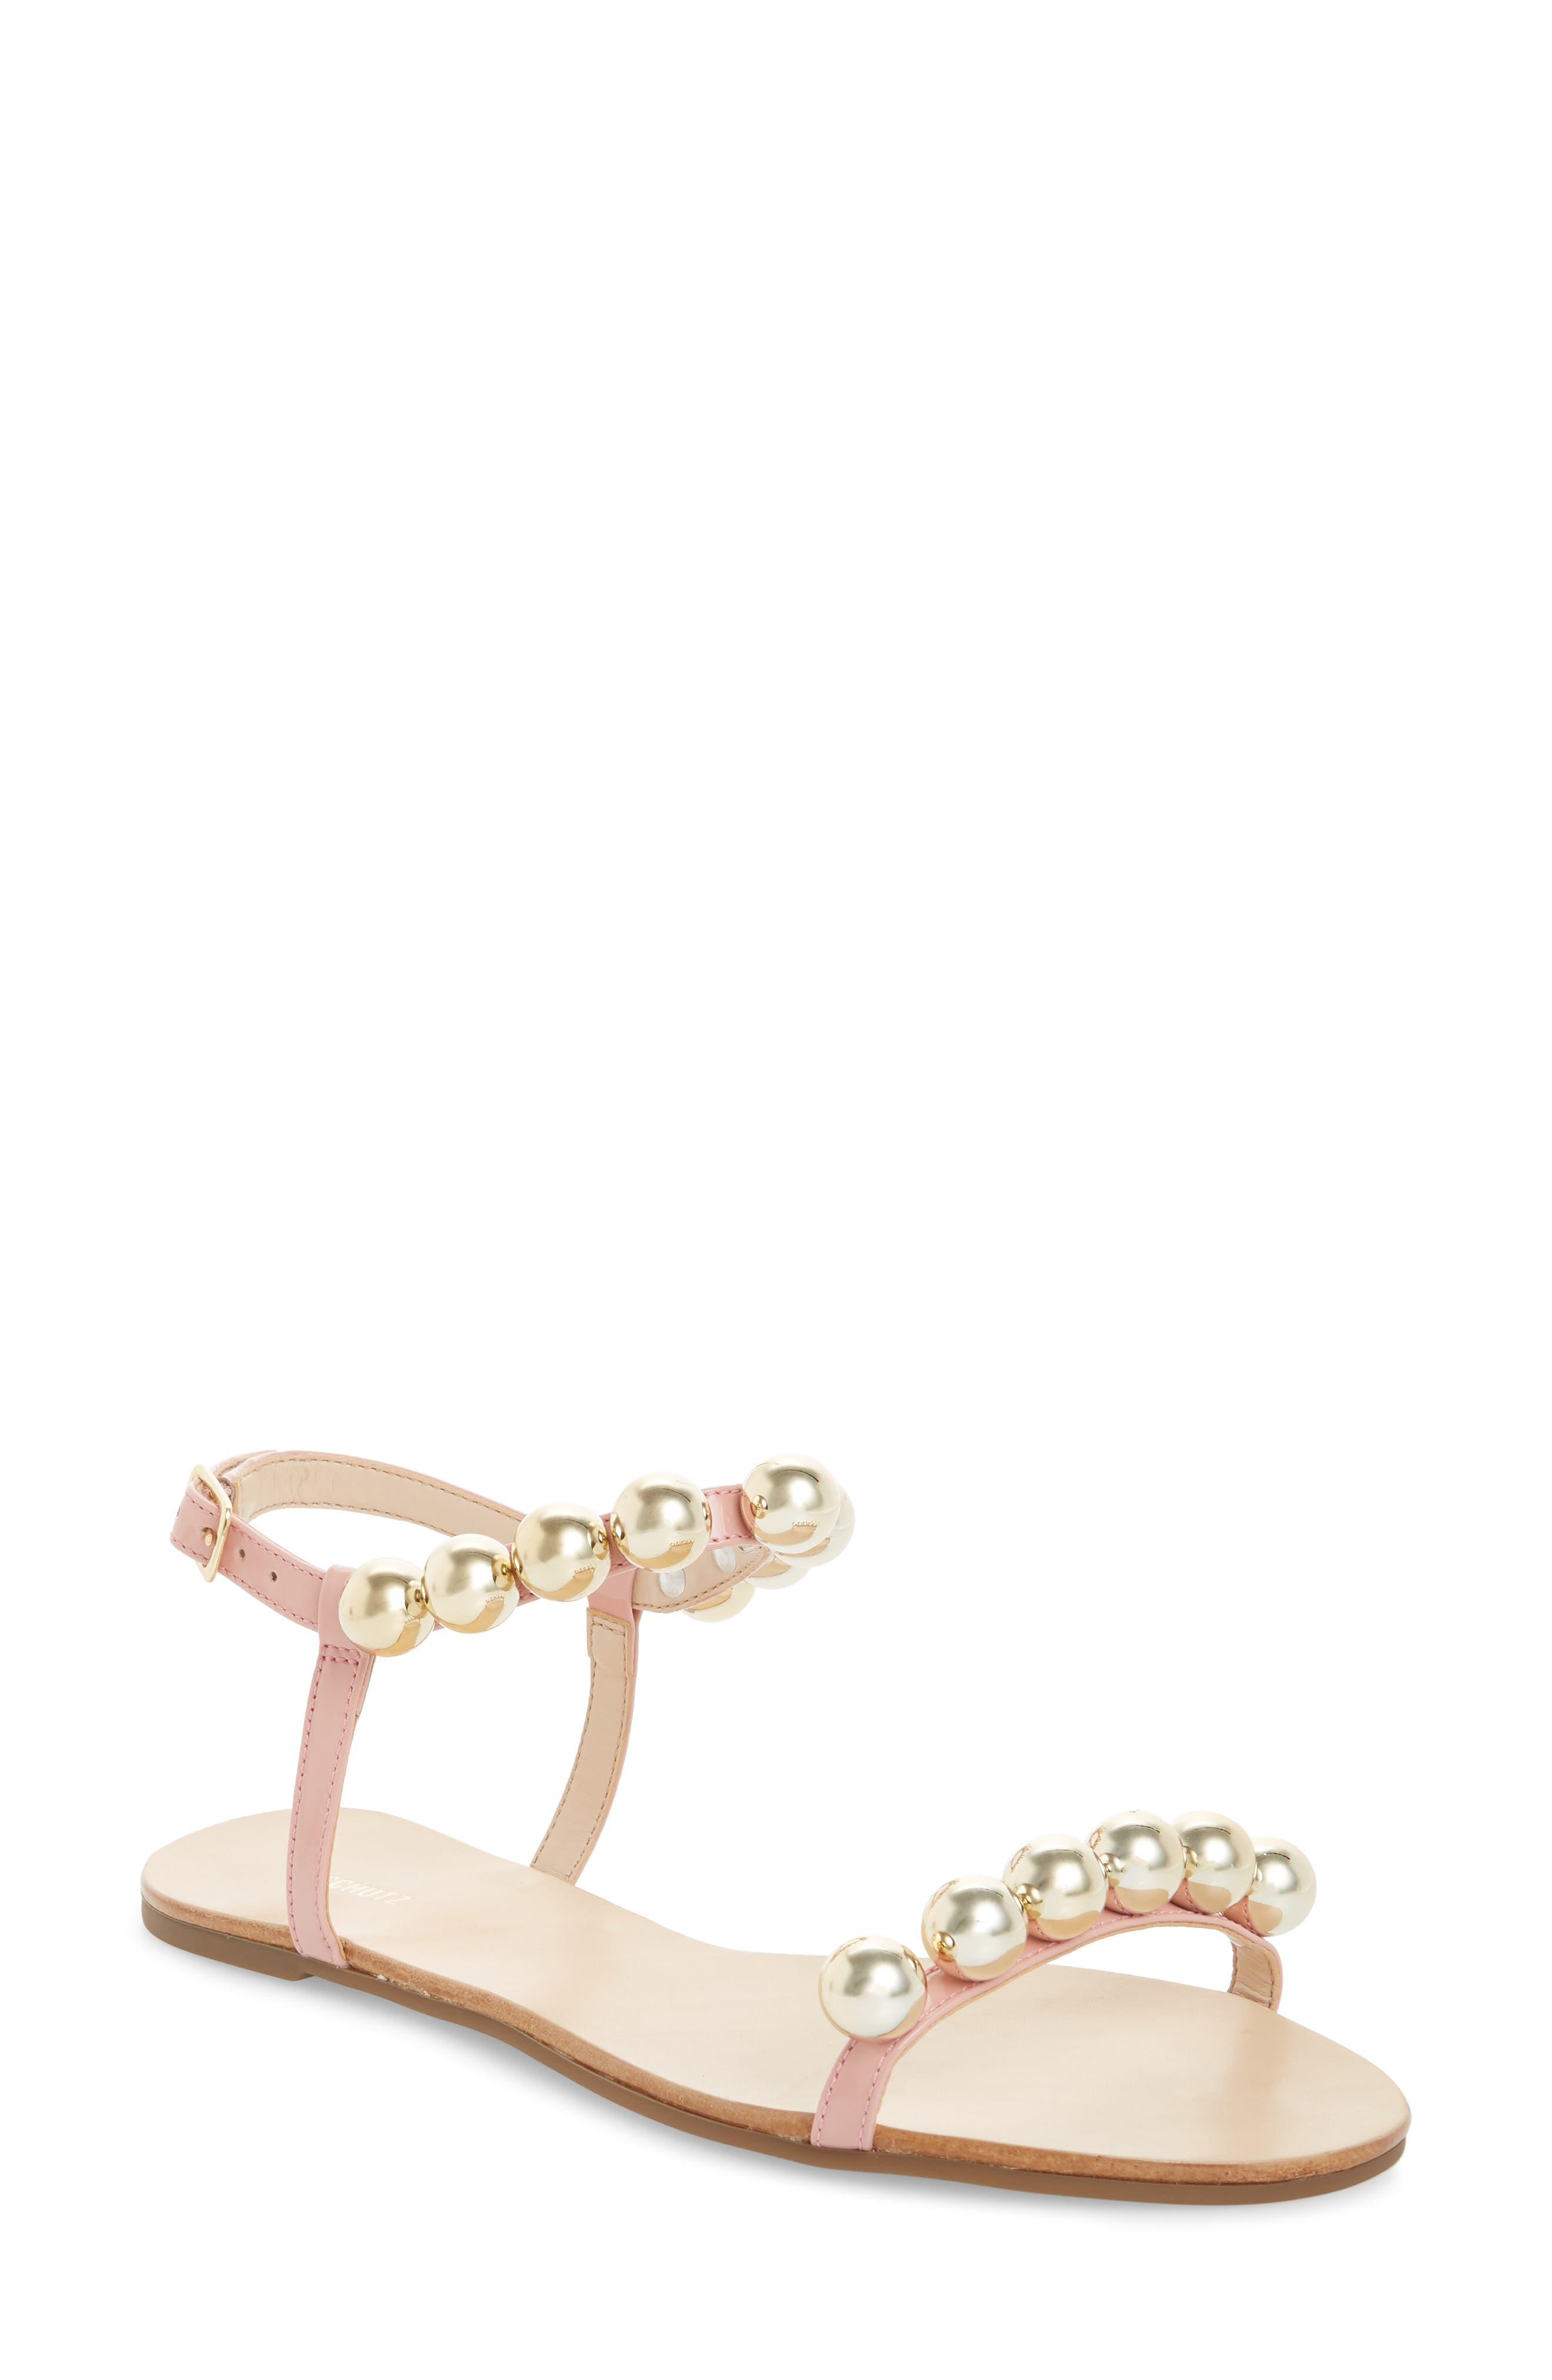 Schutz Hebe Ankle Strap Sandal (Women)